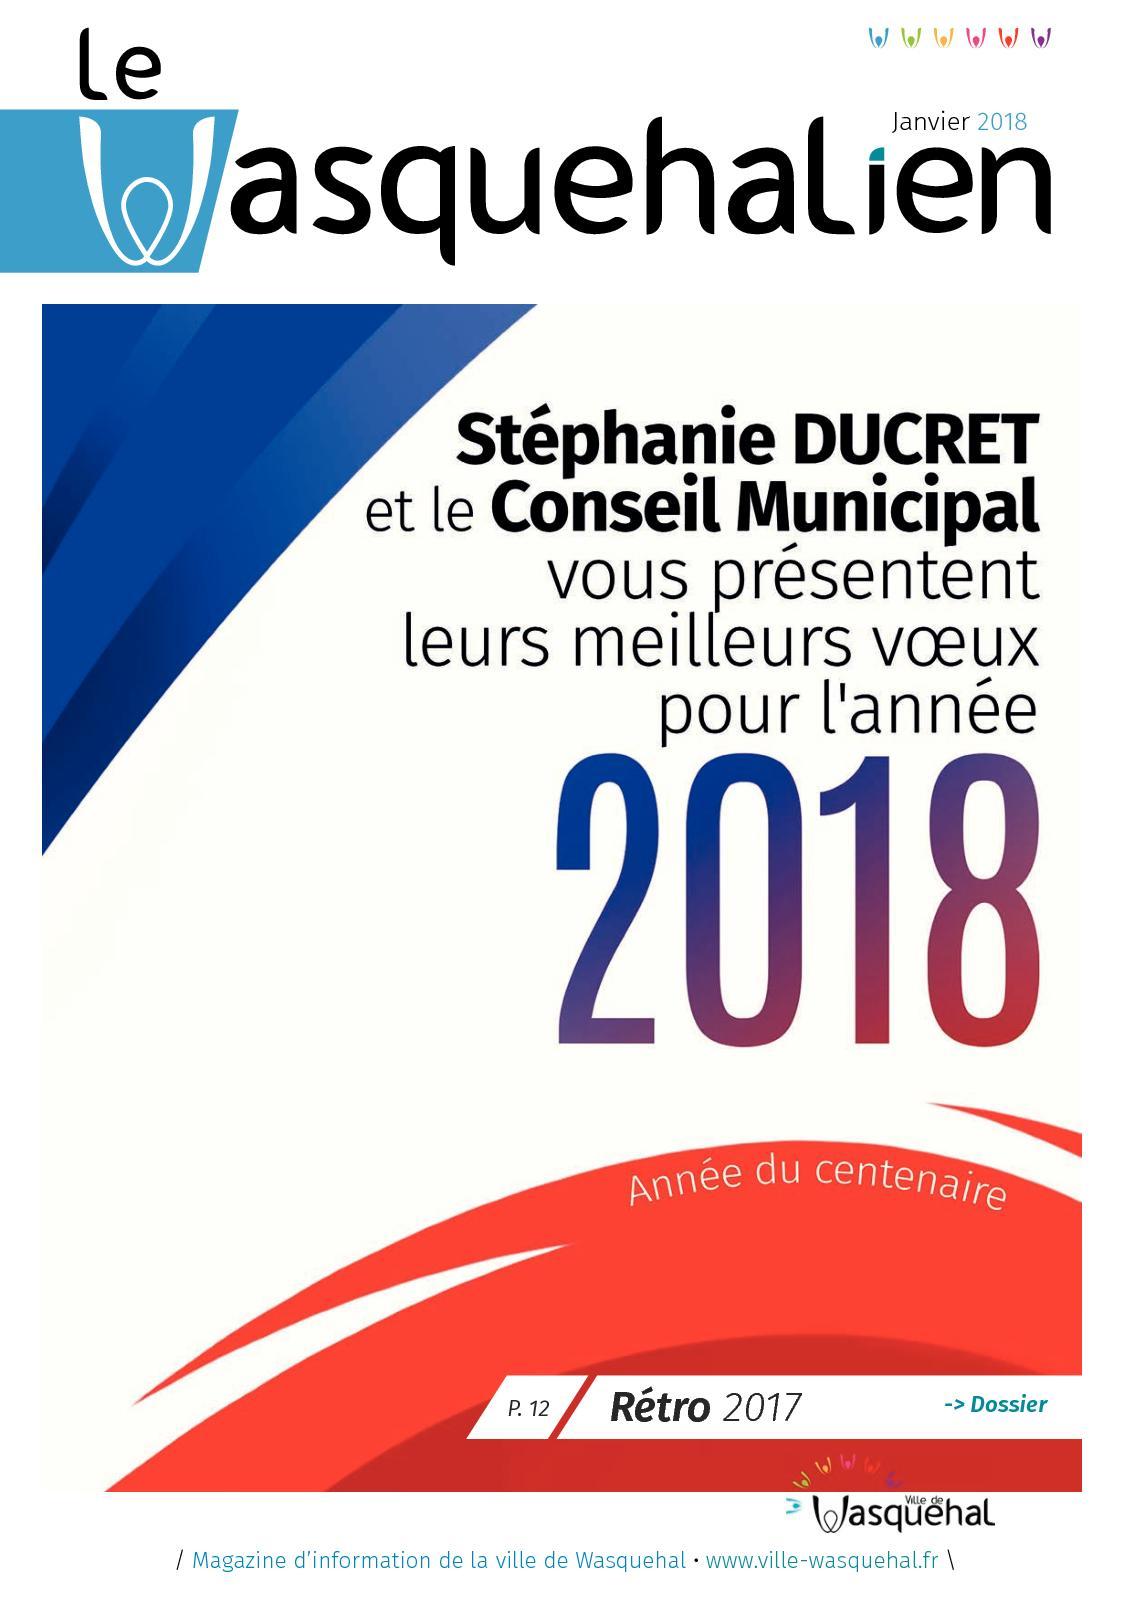 Calam o wasquehalien janvier 2018 for Entretien jardin wasquehal